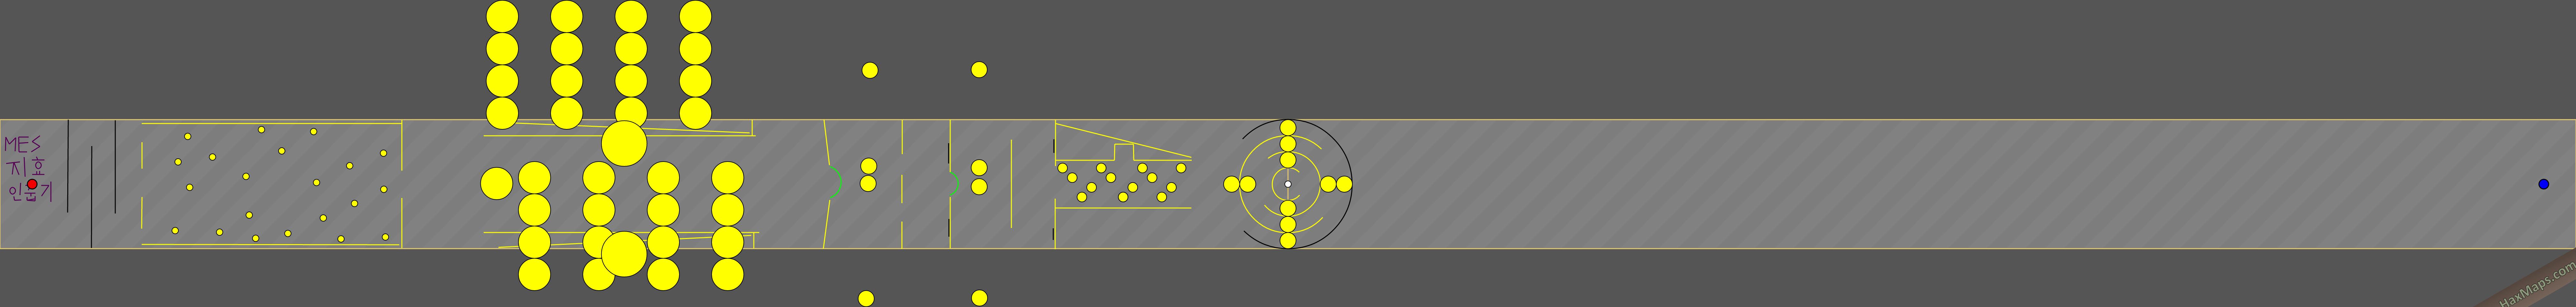 hax ball maps | Yellow Very Hard